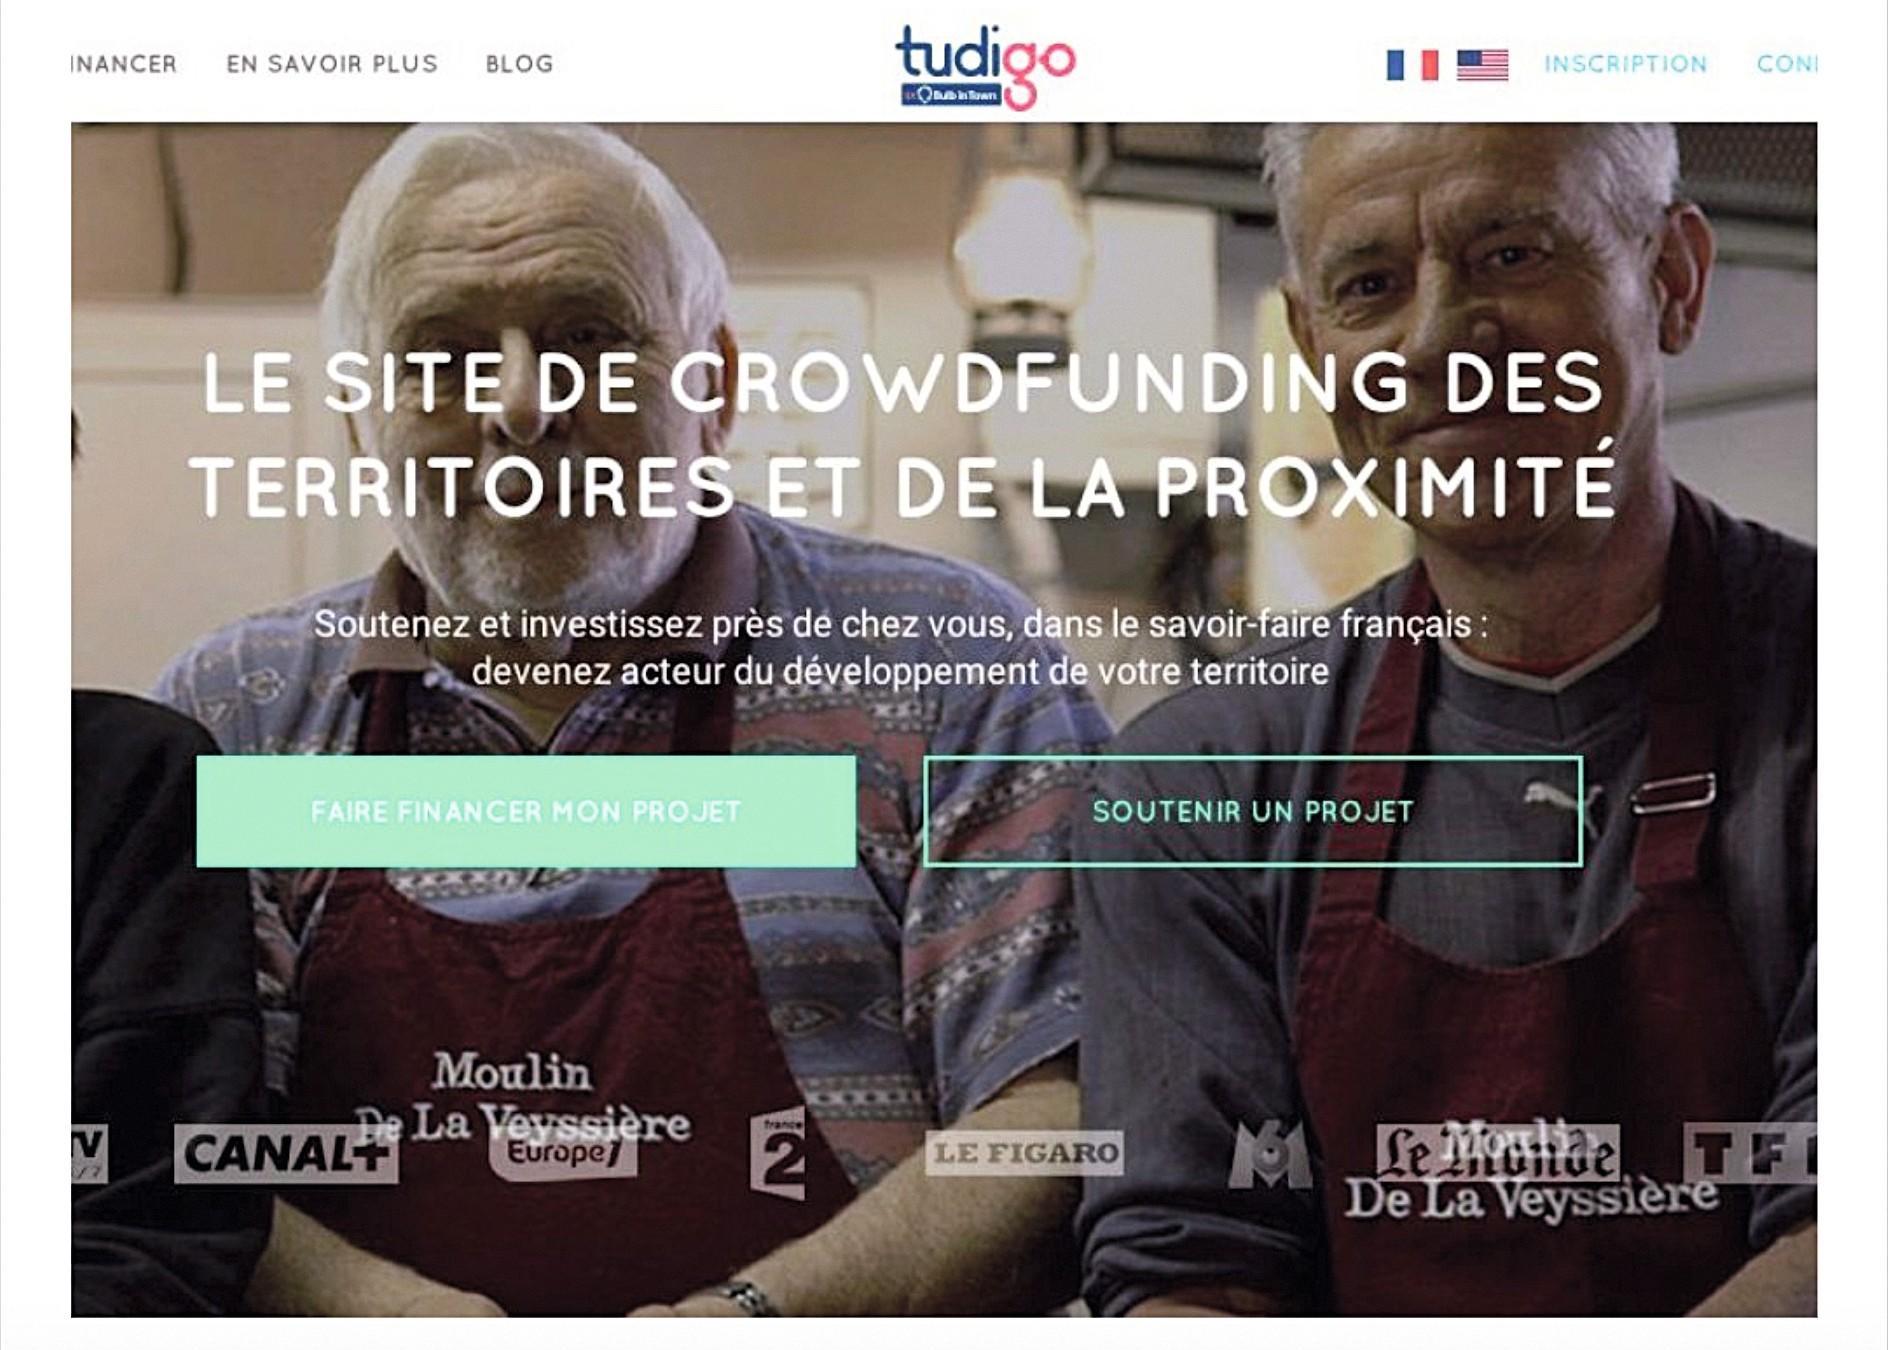 age d'accueil du site de crowdfunding Tudigo.